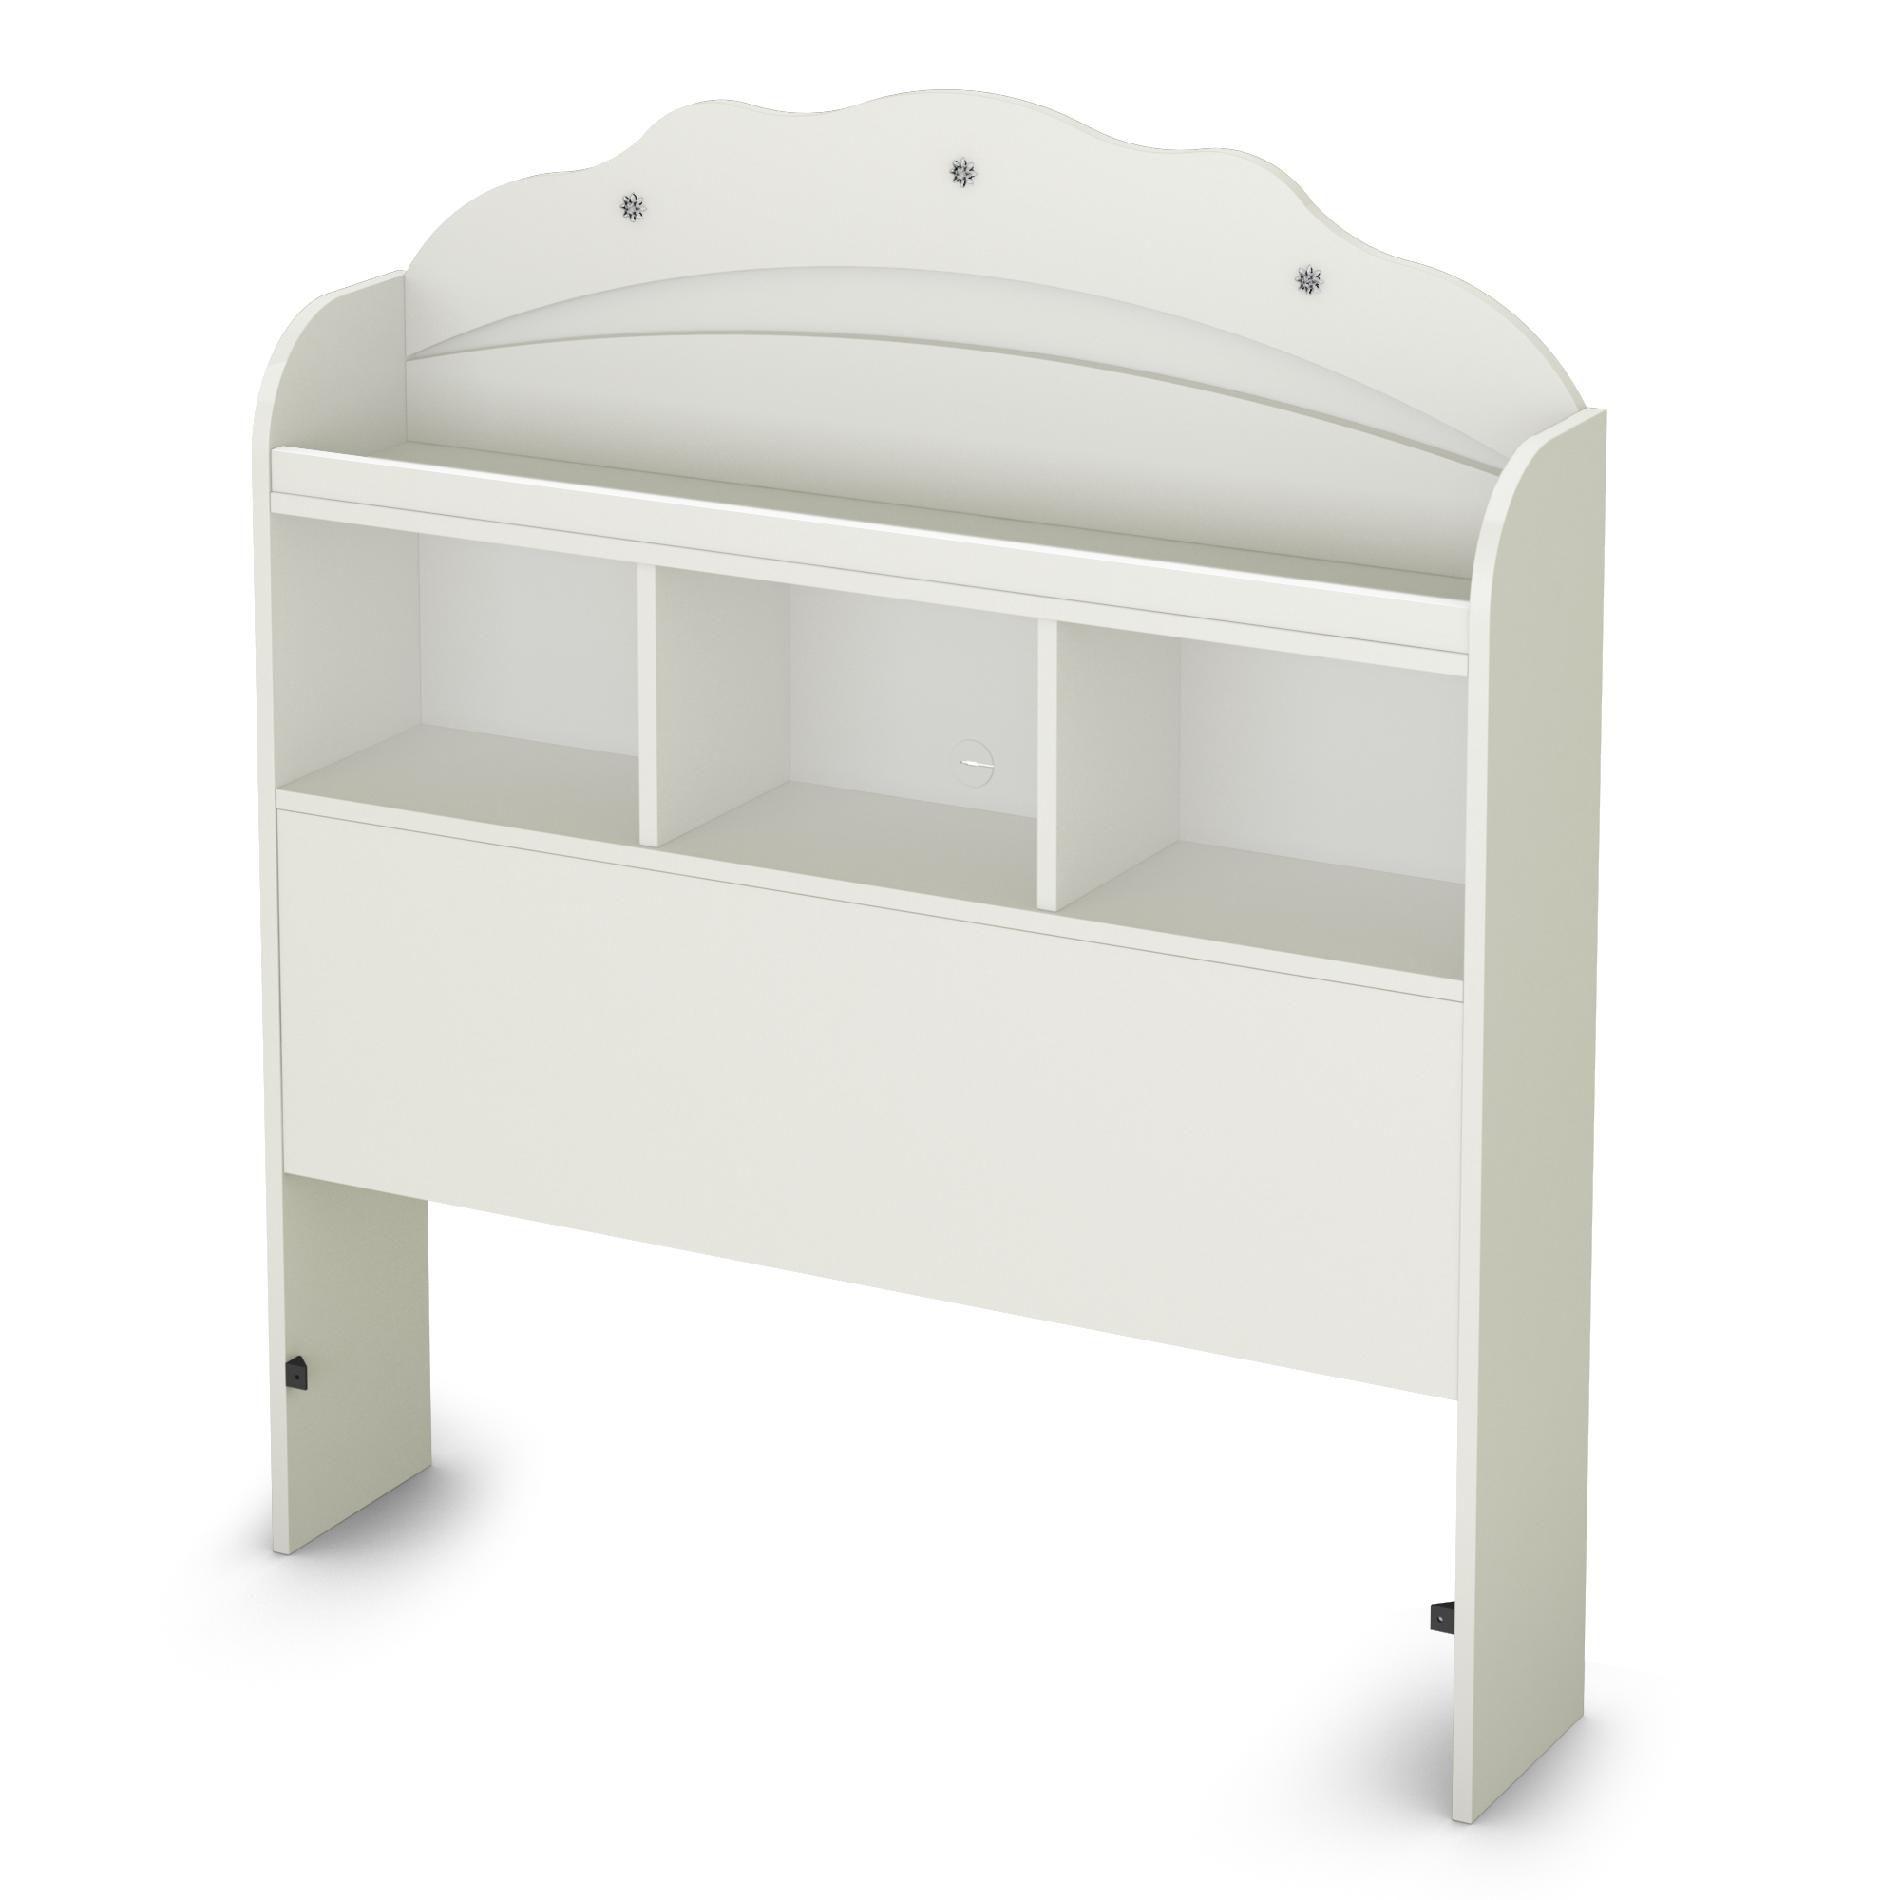 South Shore Tiara Collection Twin 39-inch Bookcase Headboard Pure White